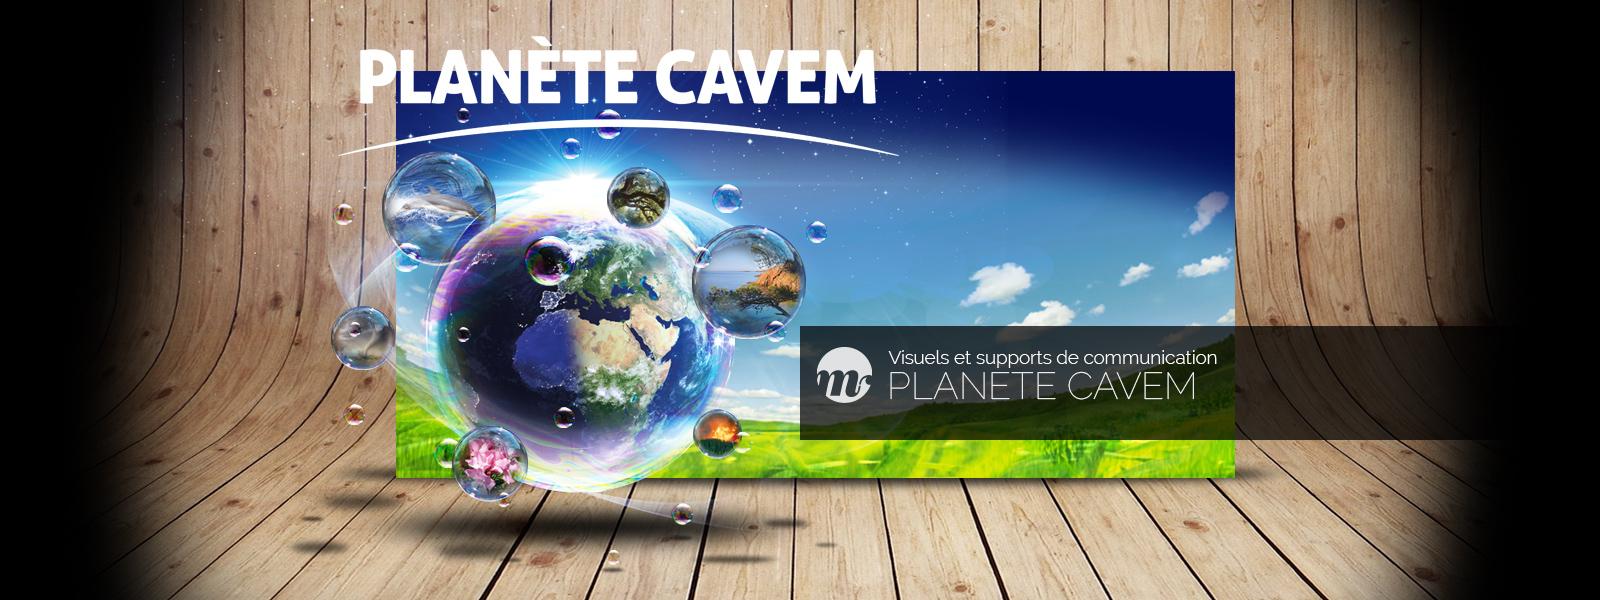 Planete CAVEM